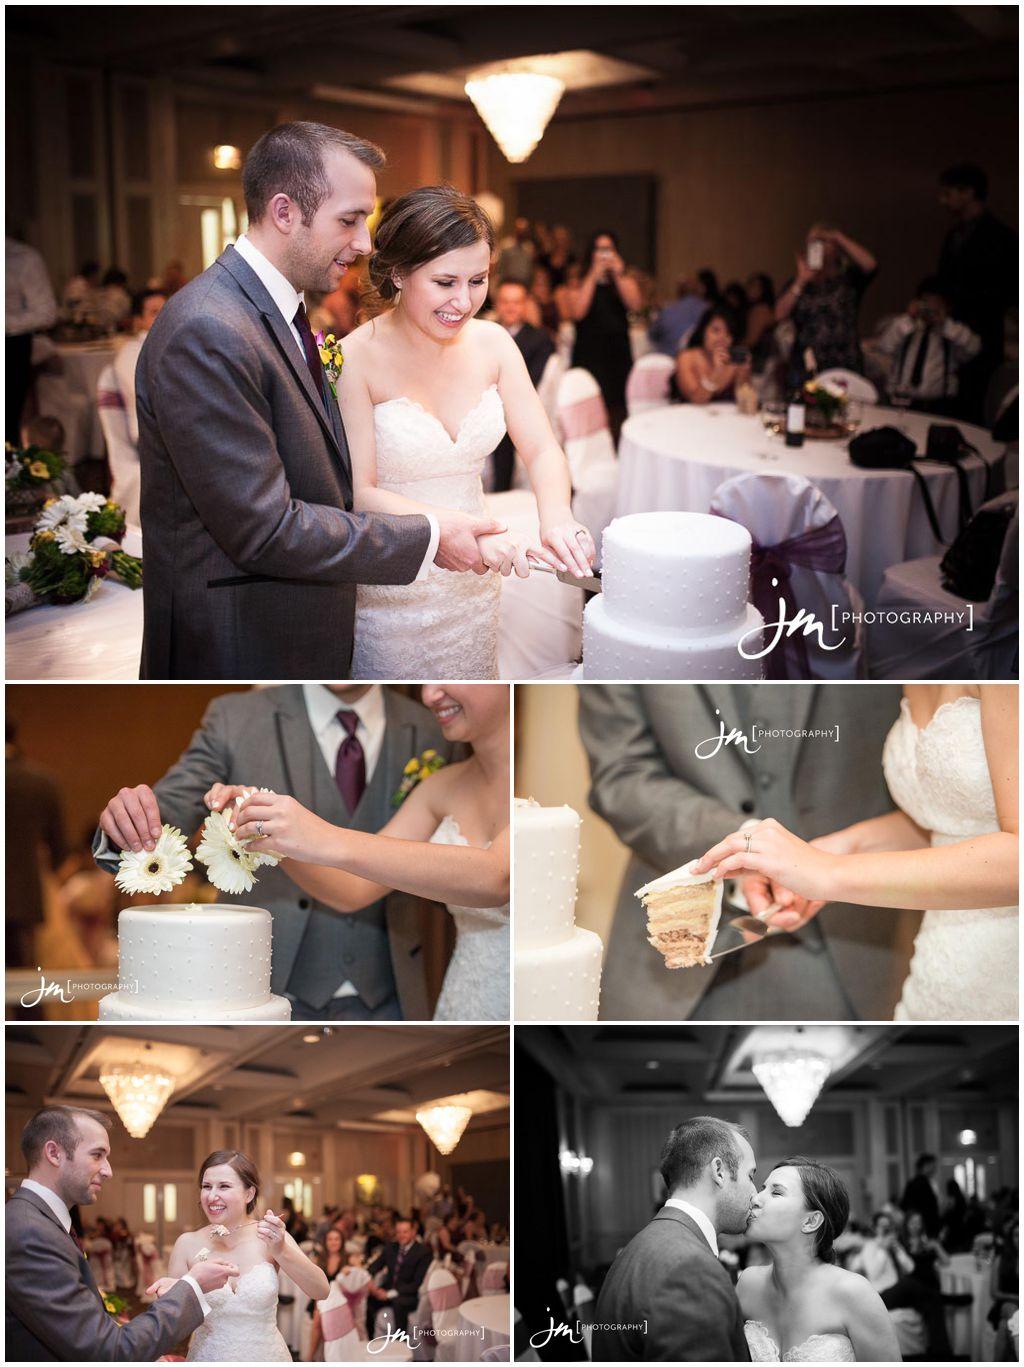 151010_7358-Calgary-Wedding-Photographers-Carriage-House-Inn-JM_Photography-Jeremy-Martel